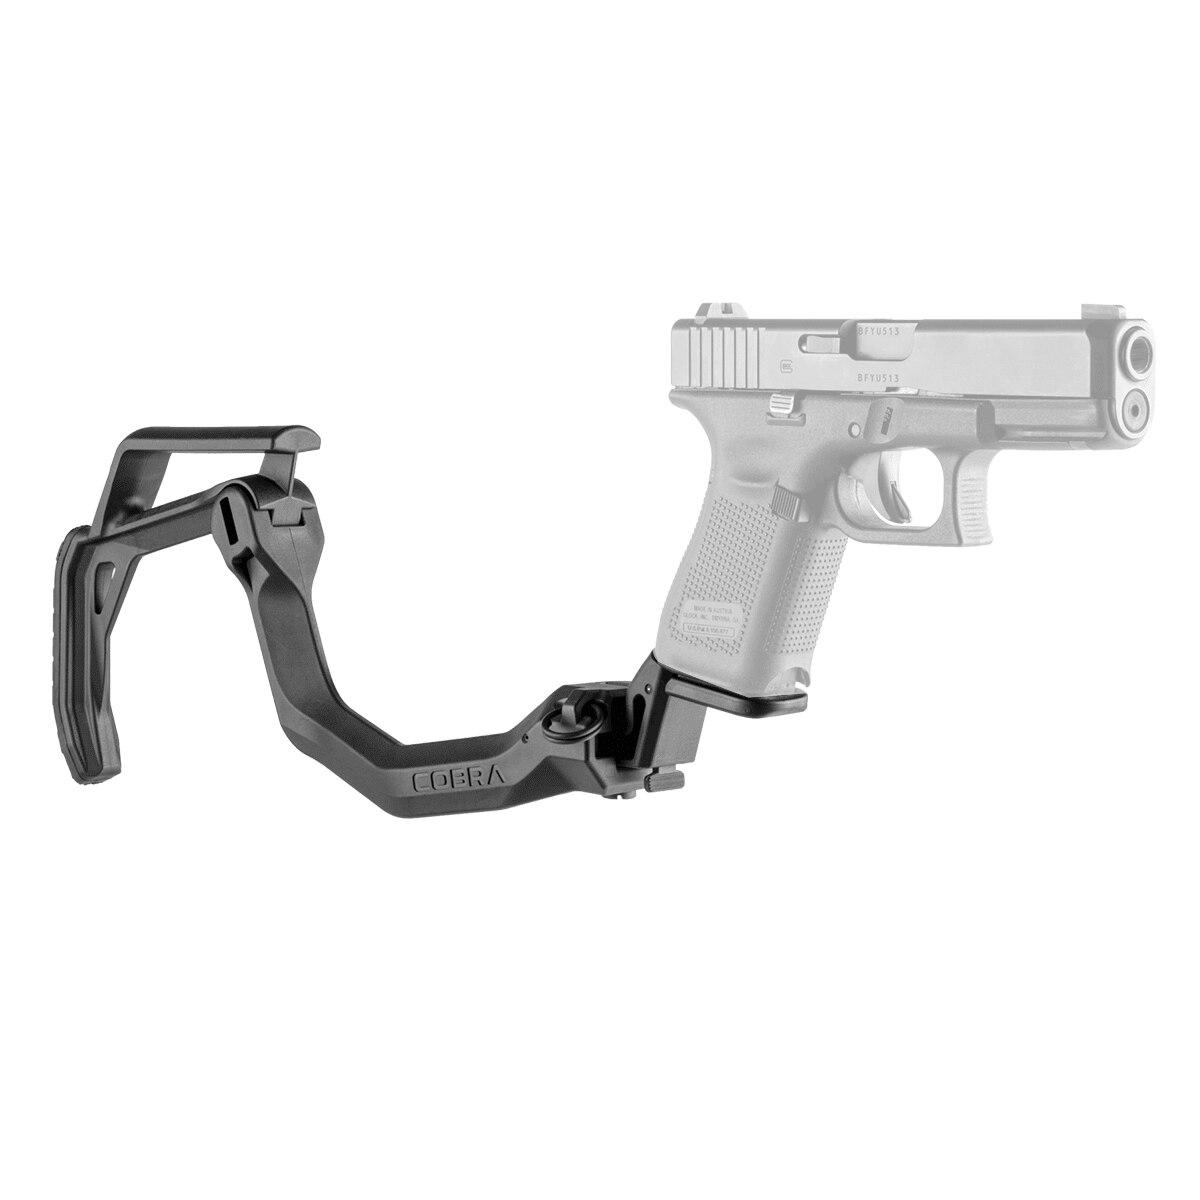 Magorui Collapsible Tactical Cobra Stock for Glock 17-19 Glock Folding Buttstock